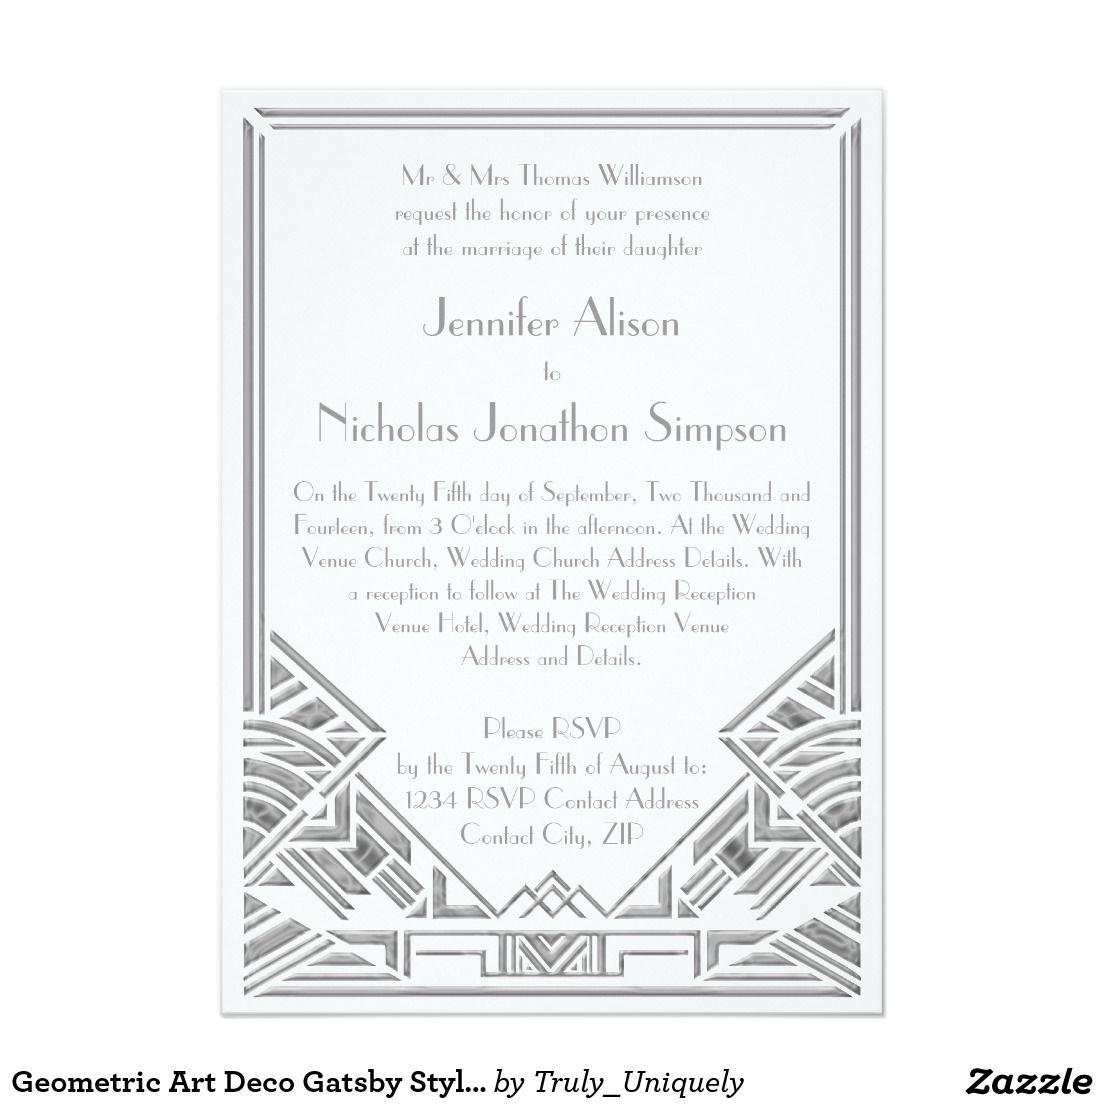 Geometric Art Deco Gatsby Style Wedding Invites | Gatsby style ...